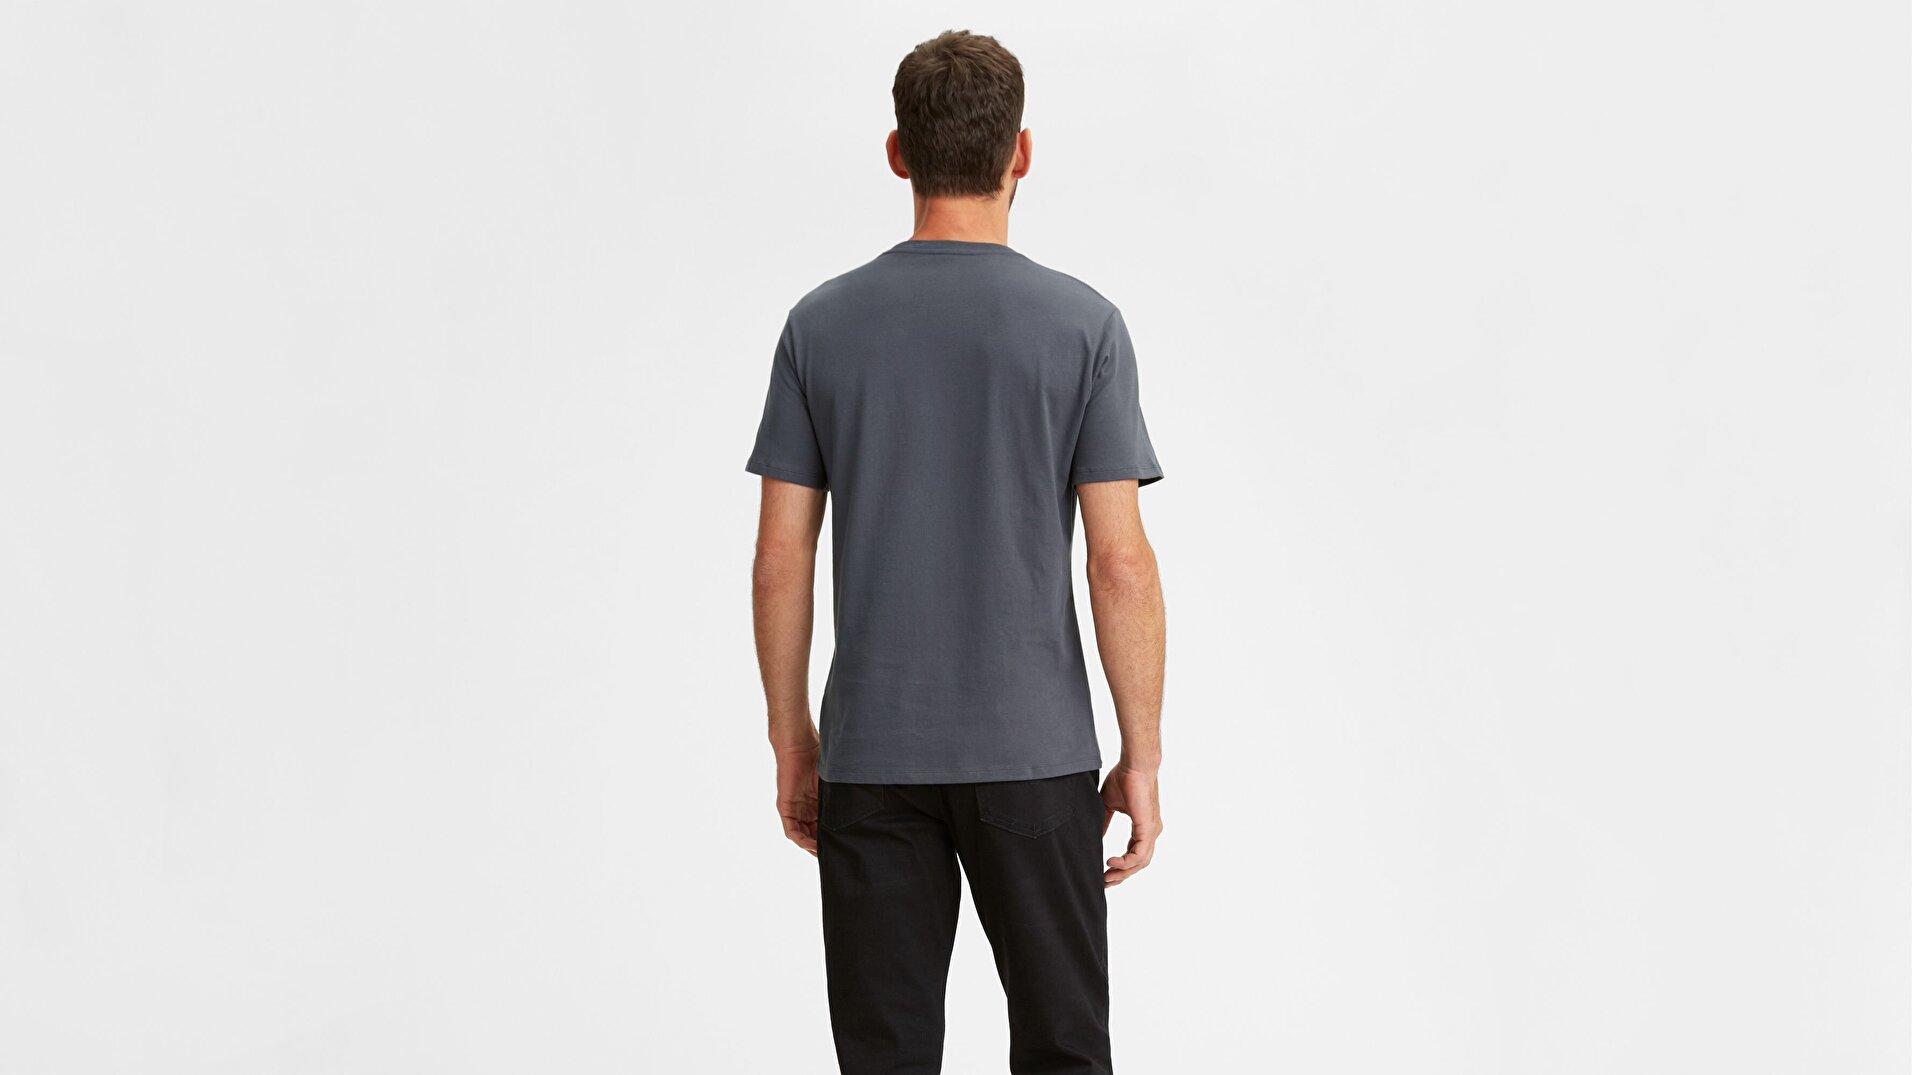 Housemark Graphic Tee Ssnl Hm Siyah Erkek Tişört